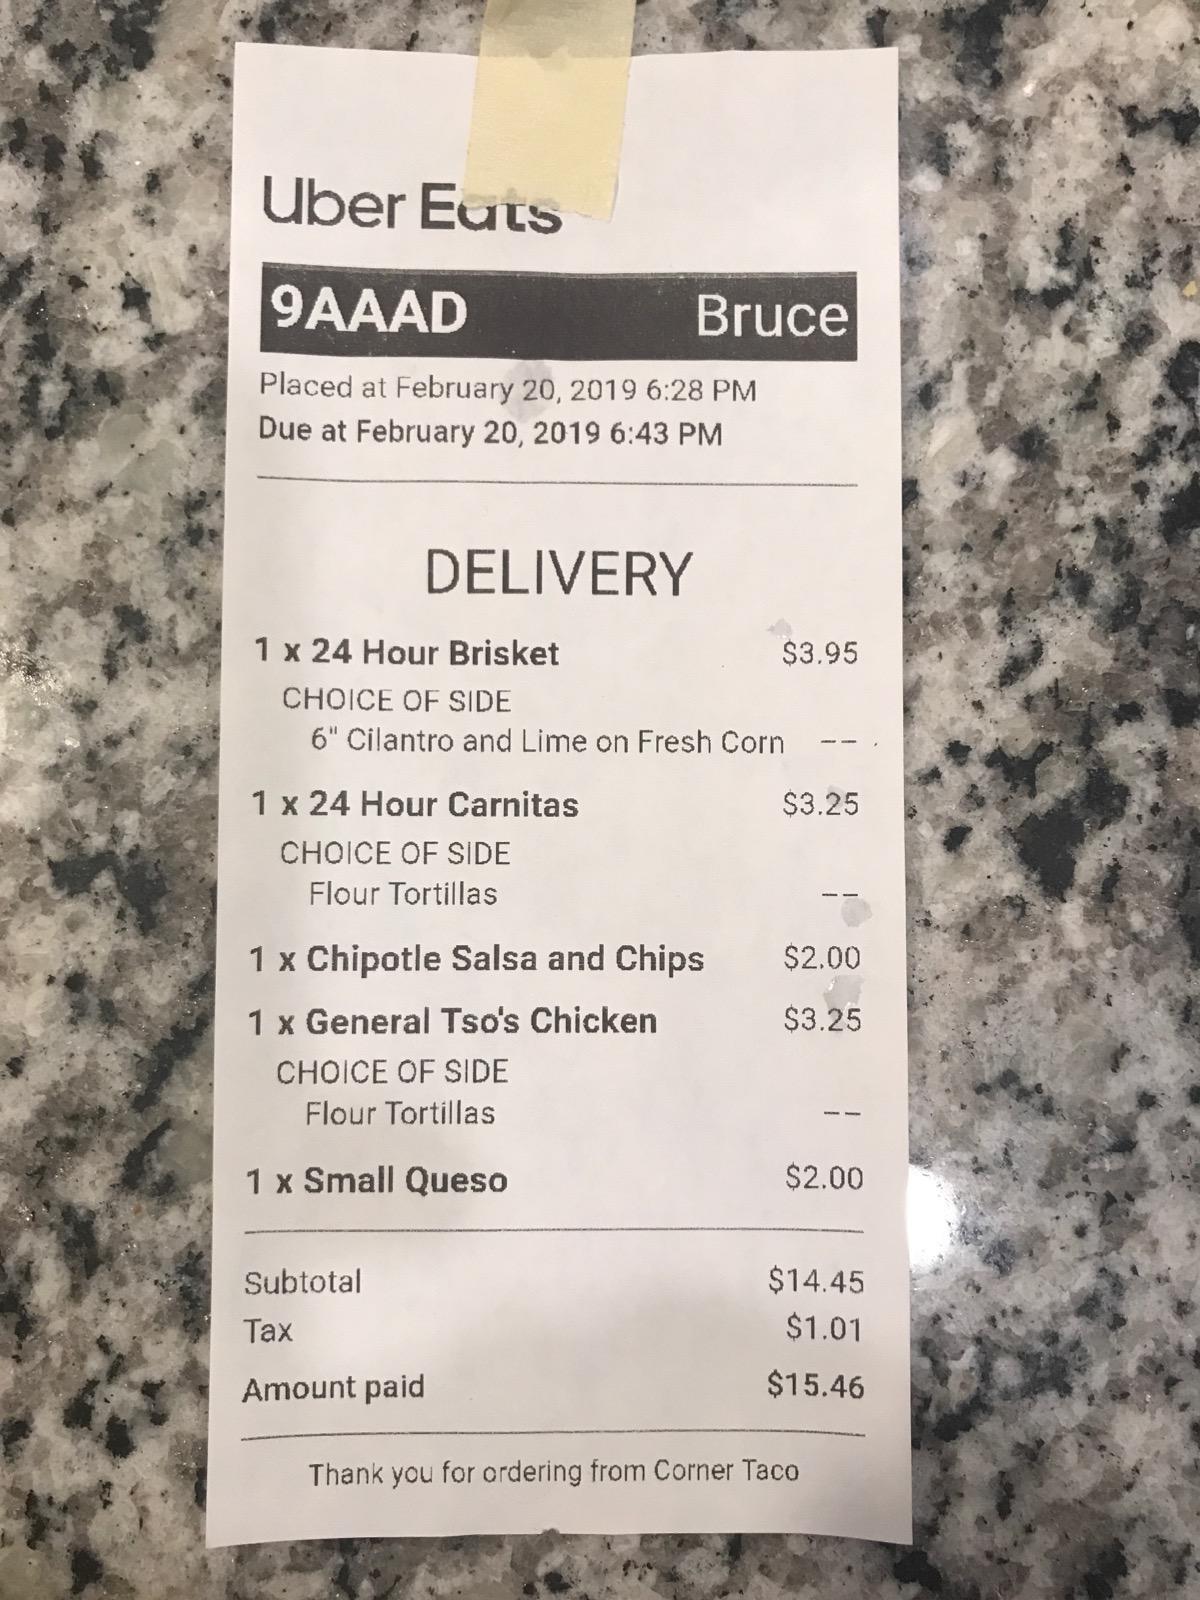 Customer #1 - Receipt